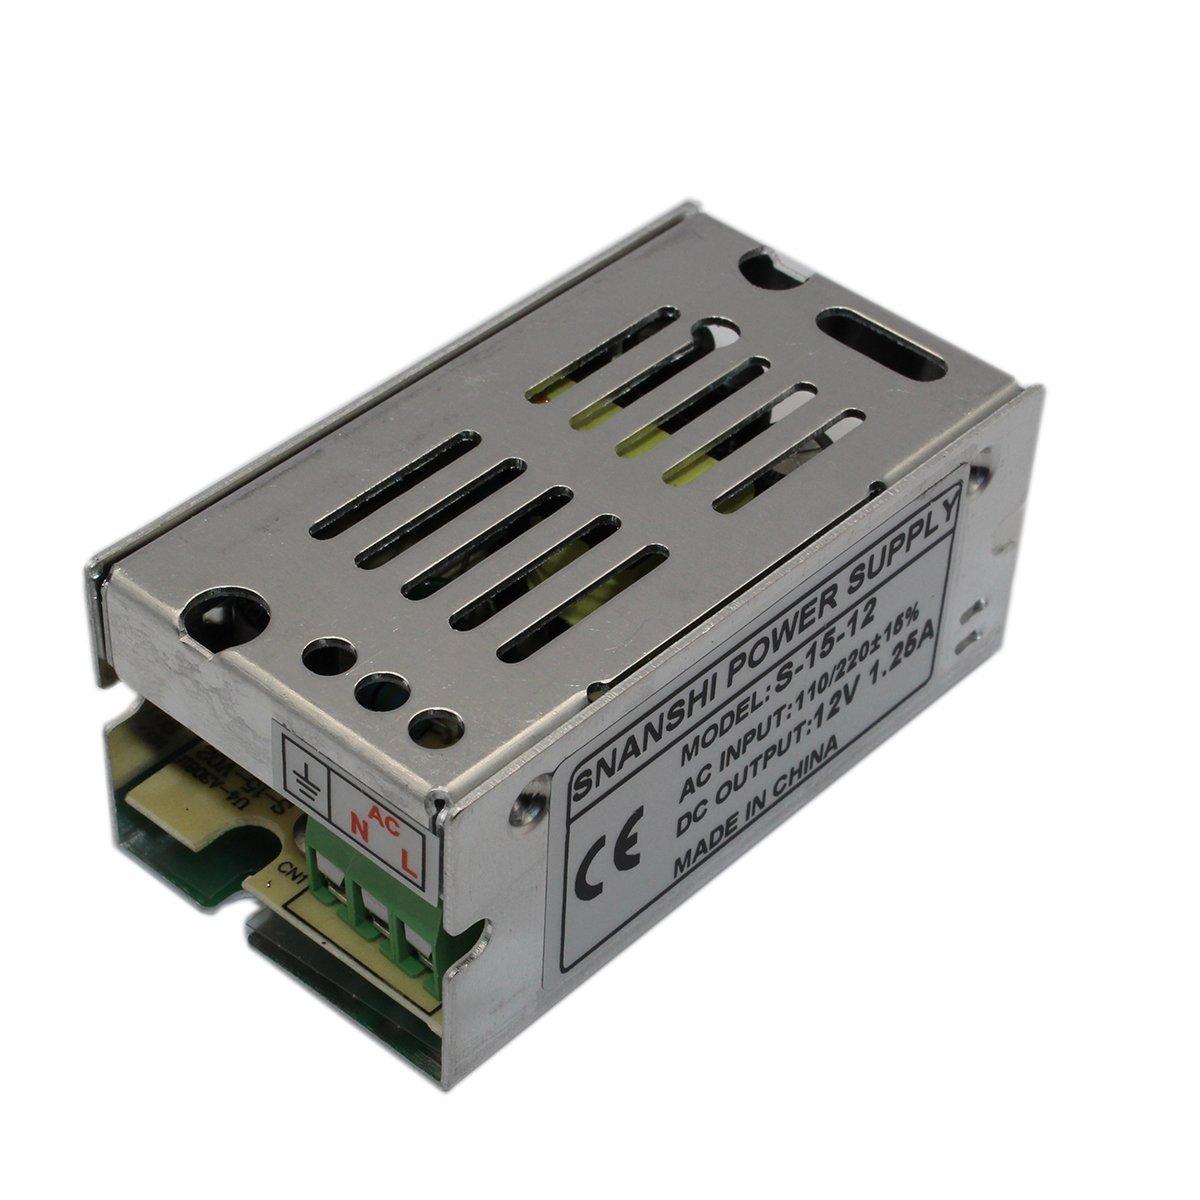 SNANSHI 12V 1.25A 15W LED Switching Power Supply Transformer 110V 220V AC to DC 12V output, for LED Strip light for CCTV